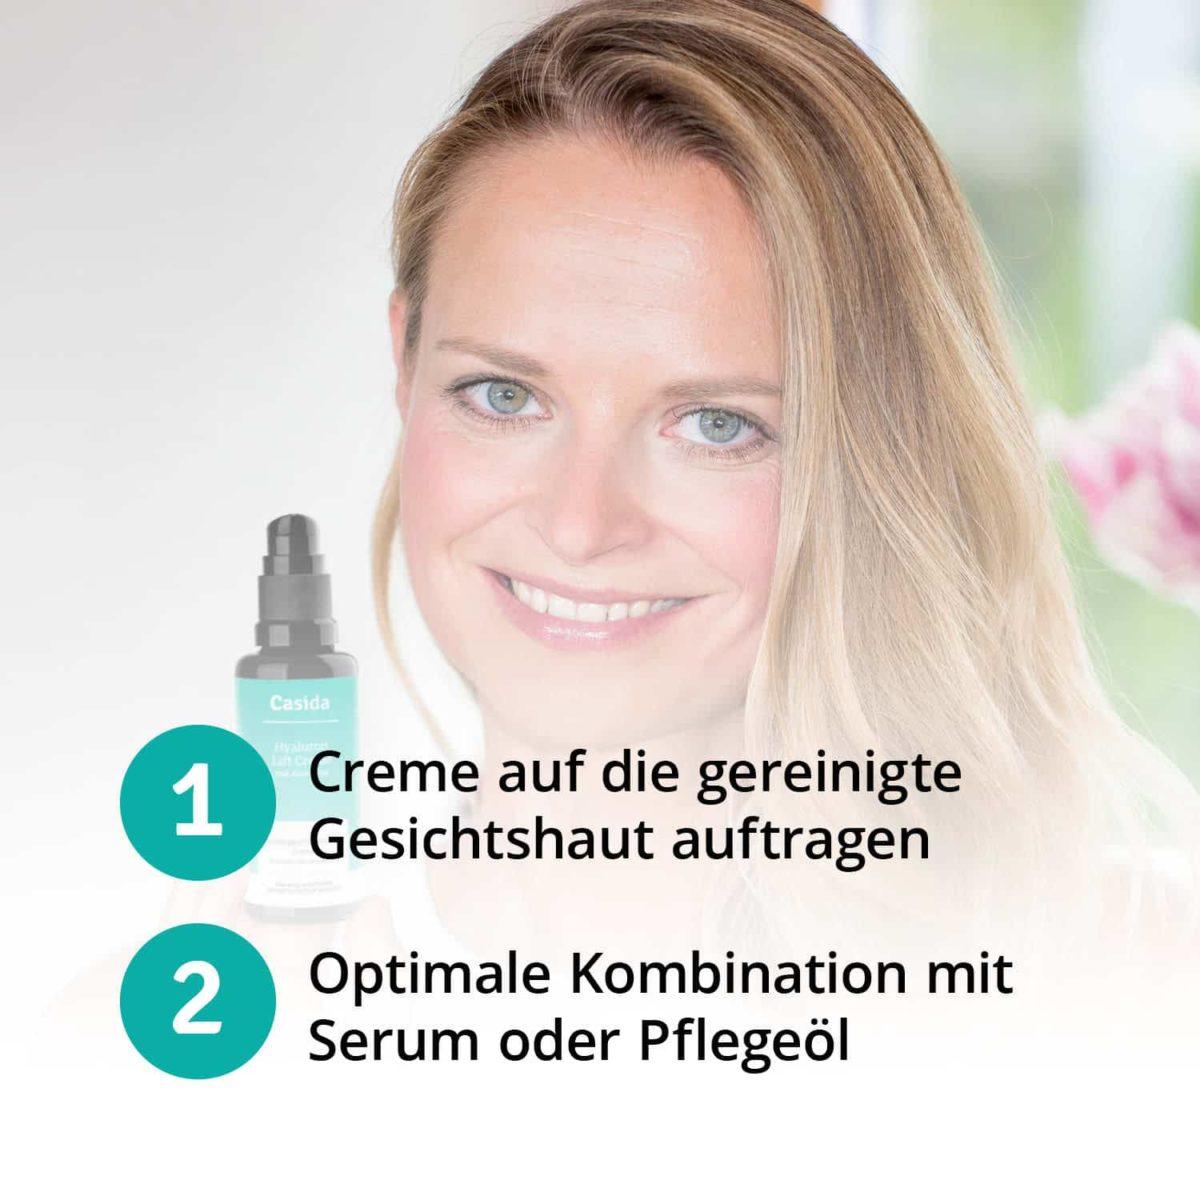 Casida Hyaluronic Acid Lift Cream with Aloe Vera 50 ml 16813082 PZN Apotheke Sommercreme Hyaluronsäure nicht-komedogen6